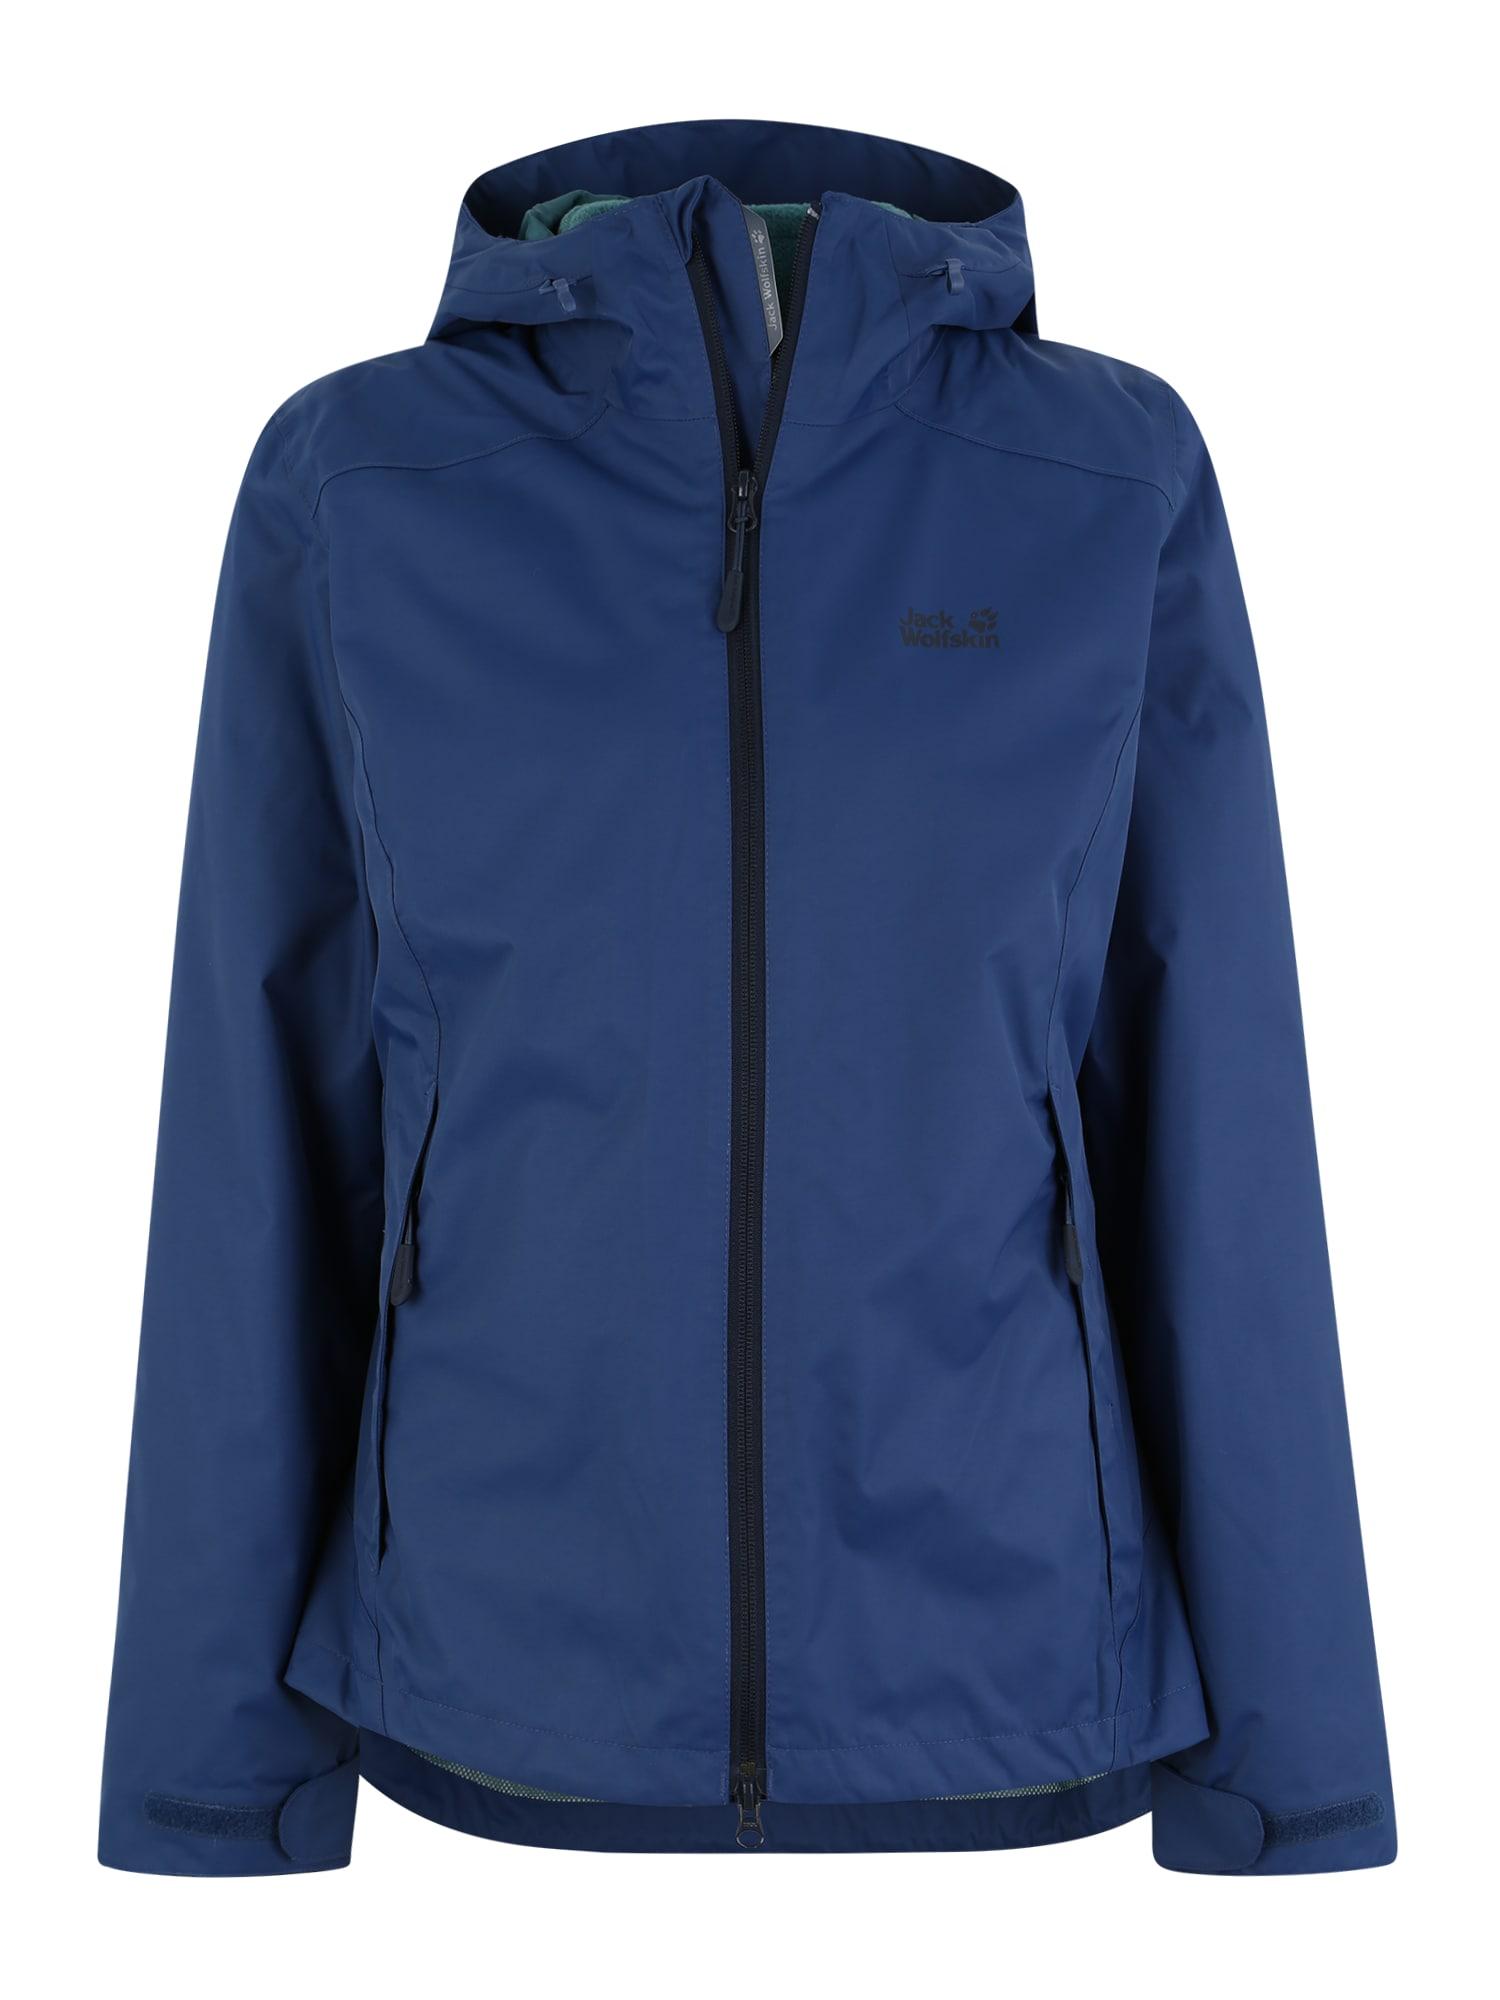 Outdoorová bunda GOTLAND 3IN1 W tmavě modrá JACK WOLFSKIN